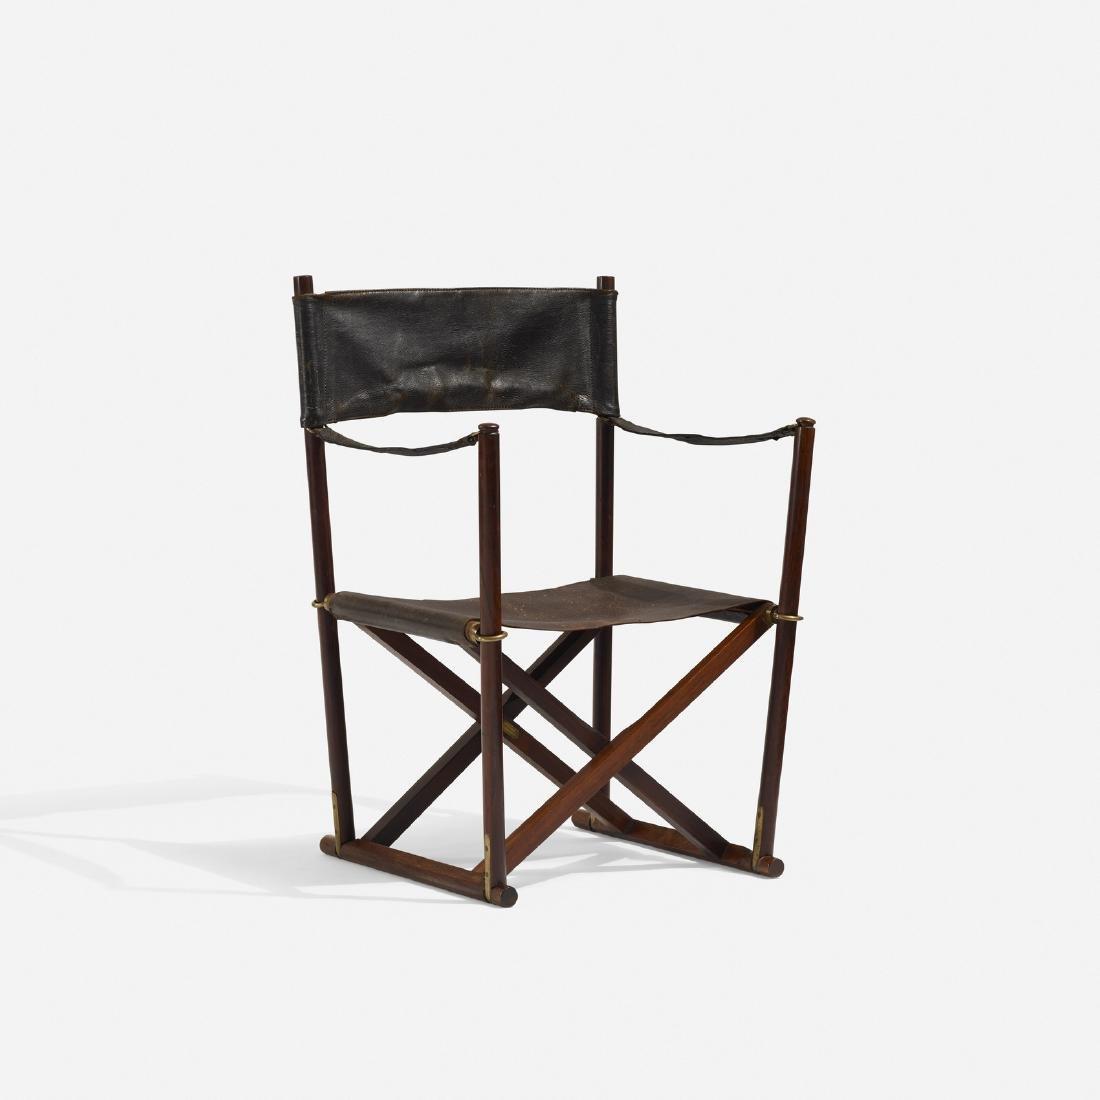 Mogens Koch, MK-16 folding chair